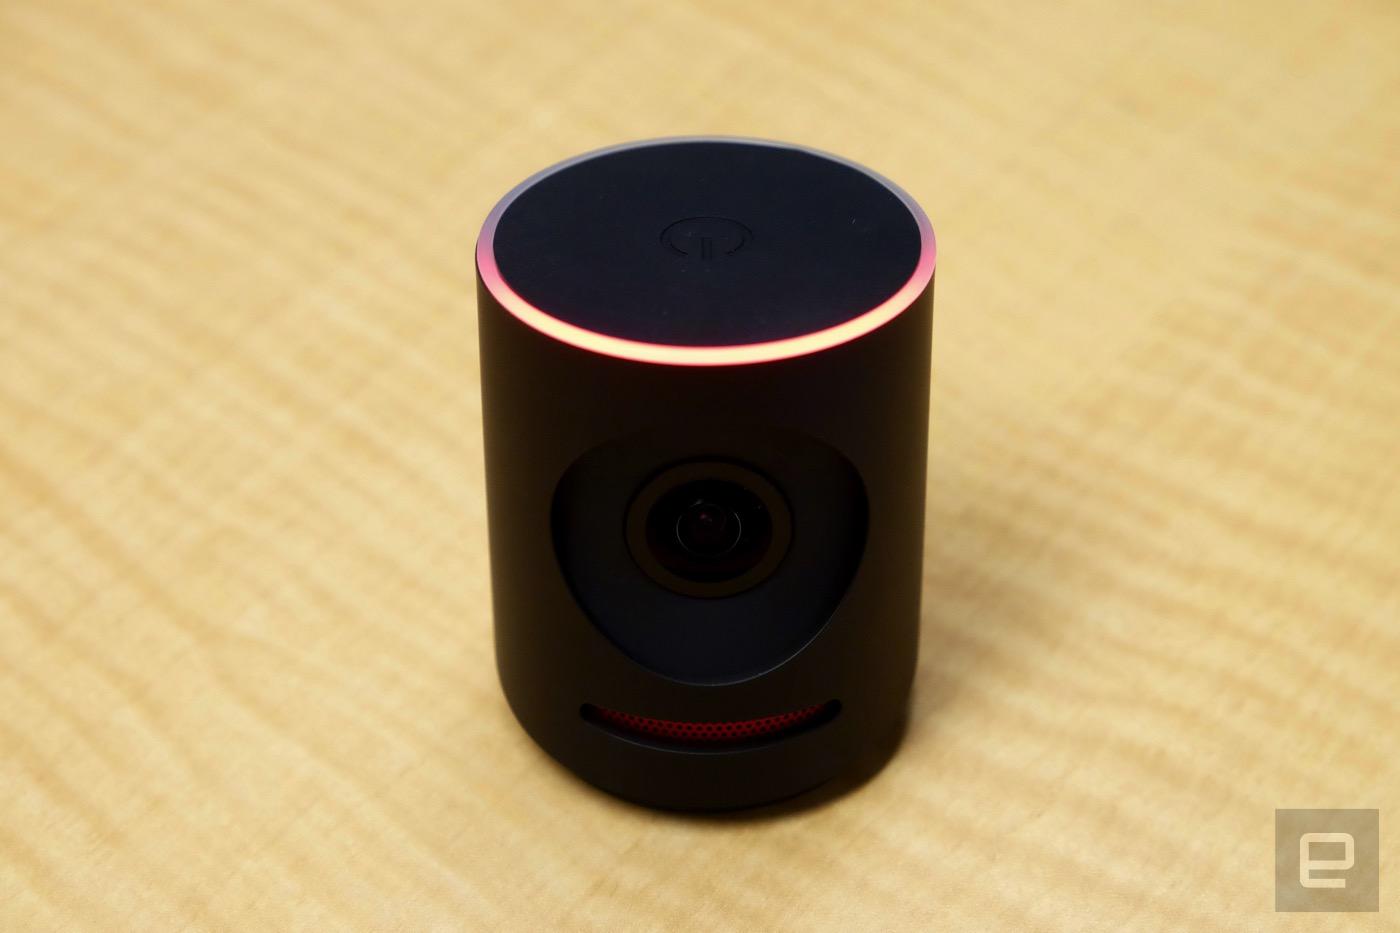 Livestream's Mevo camera lets you edit video on the fly